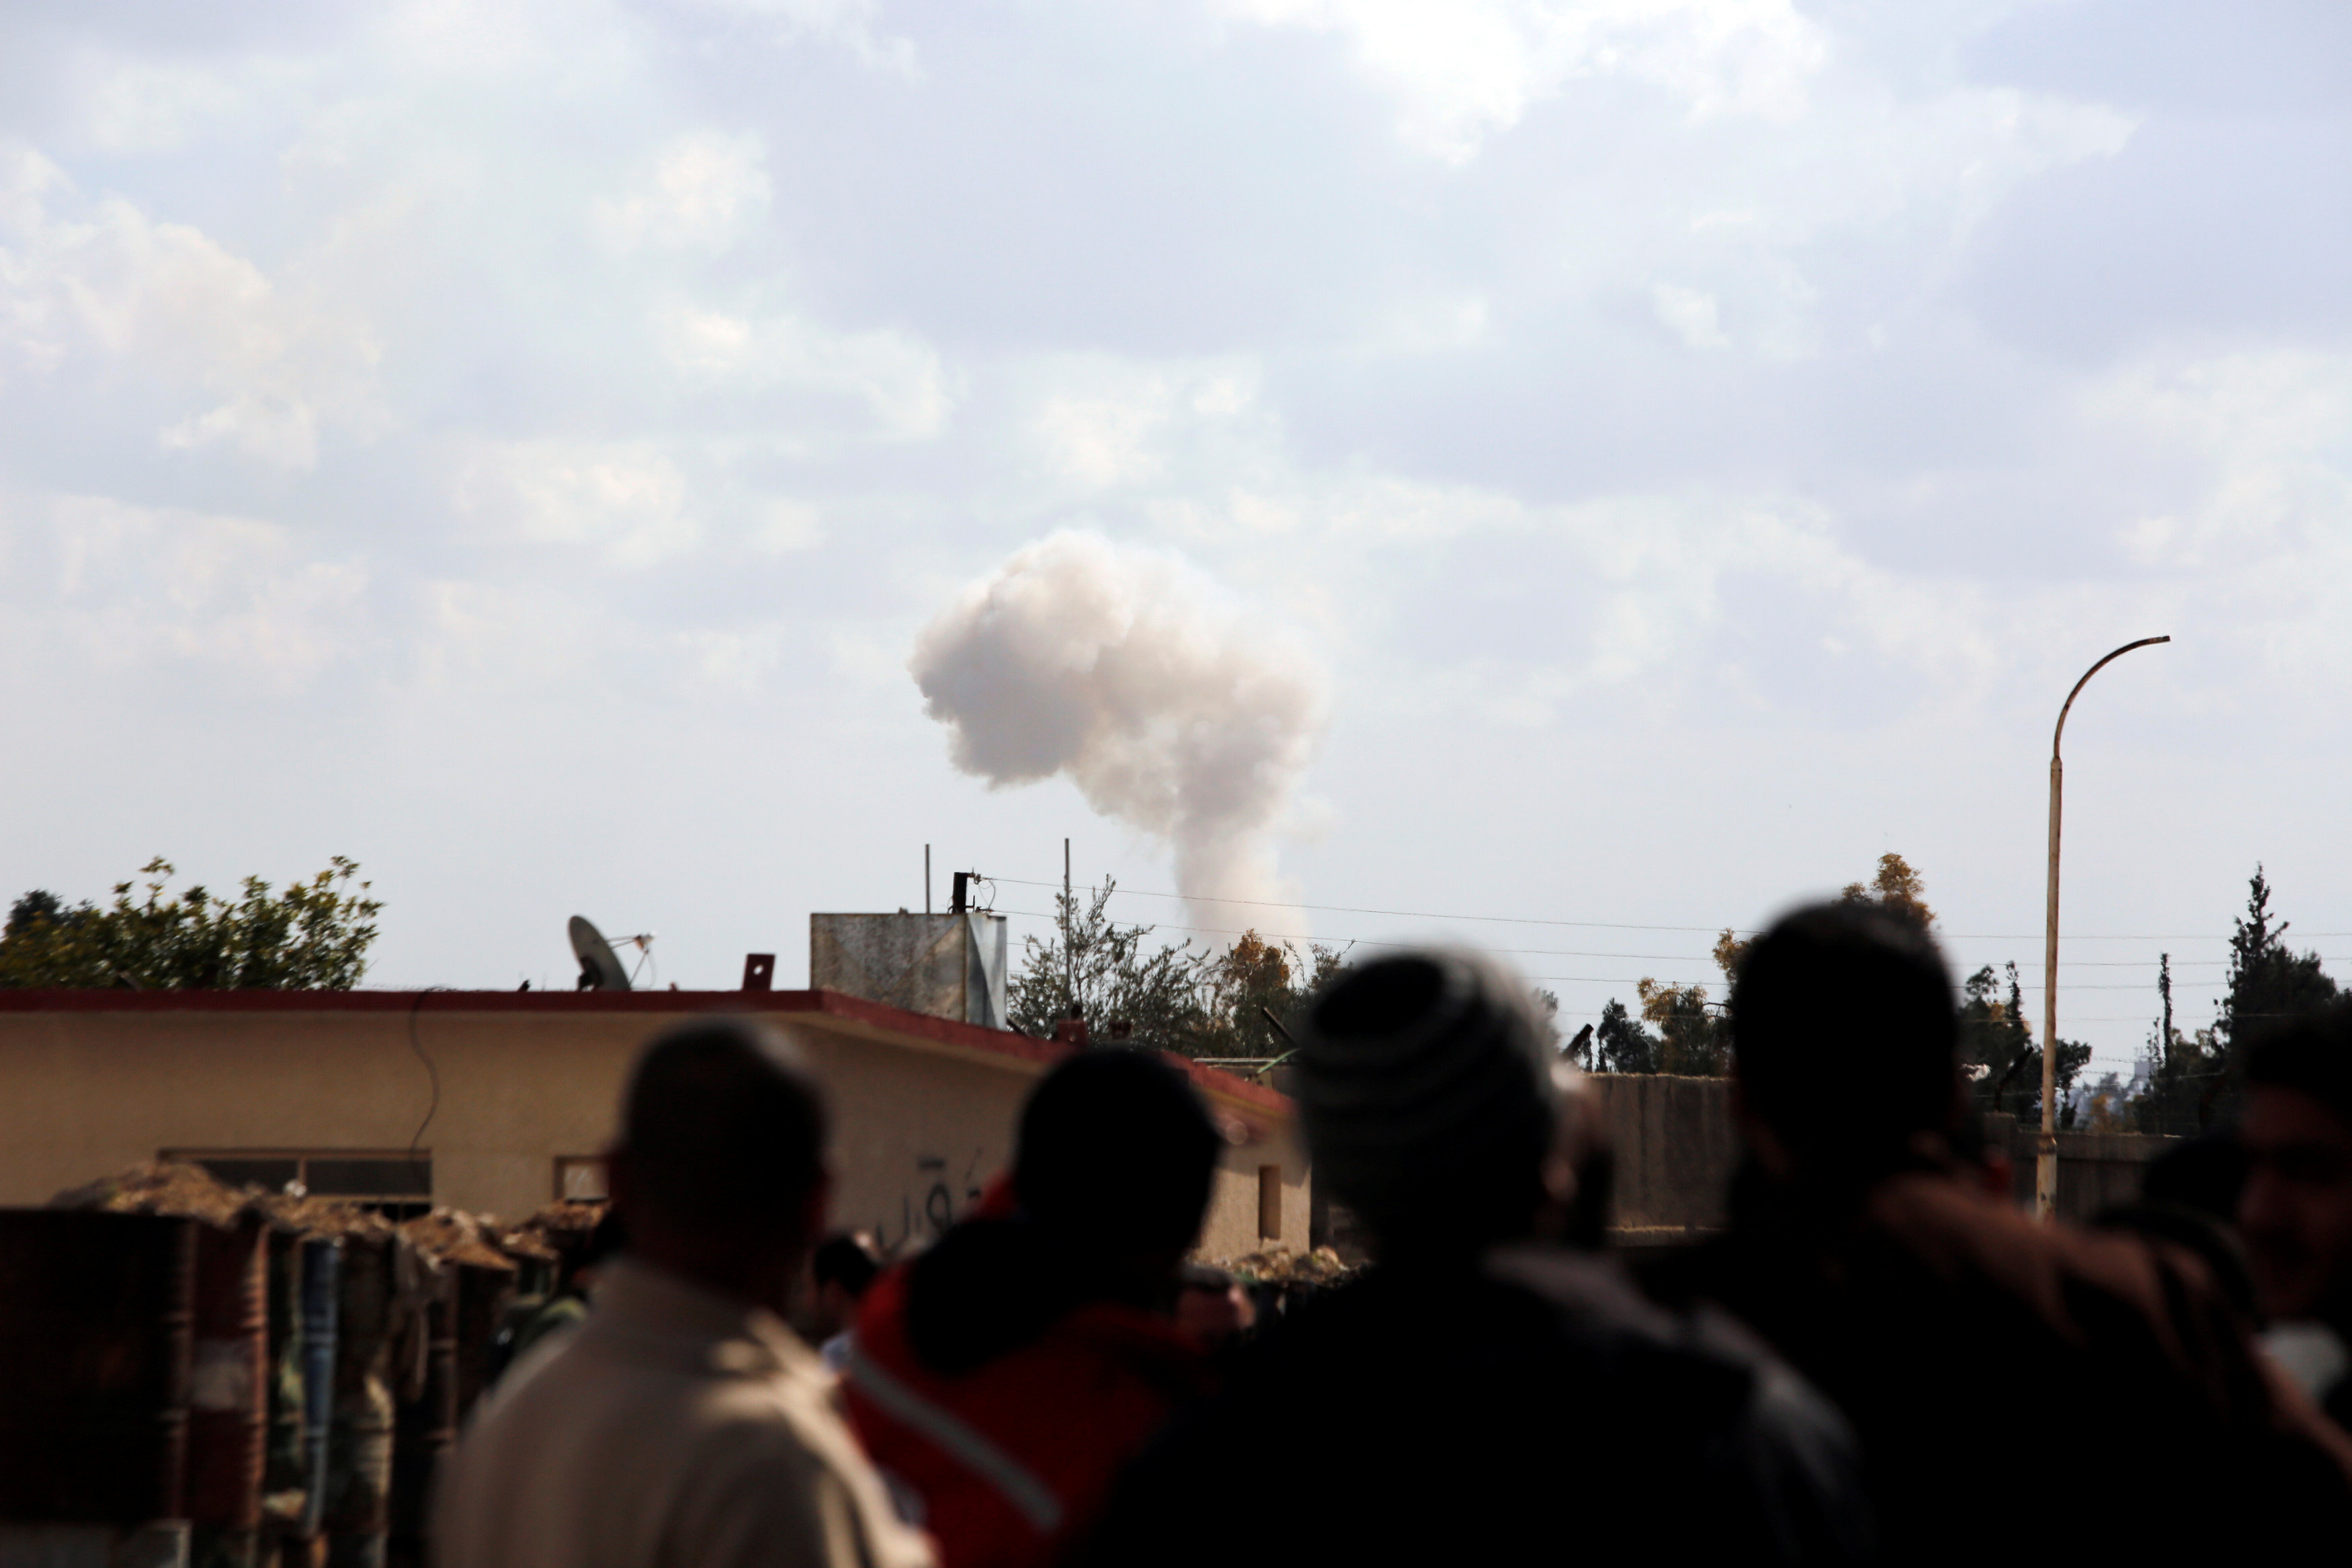 People watch as smoke rises in eastern Ghouta, Damascus, Syria February 28, 2018. REUTERS/Omar Sanadiki